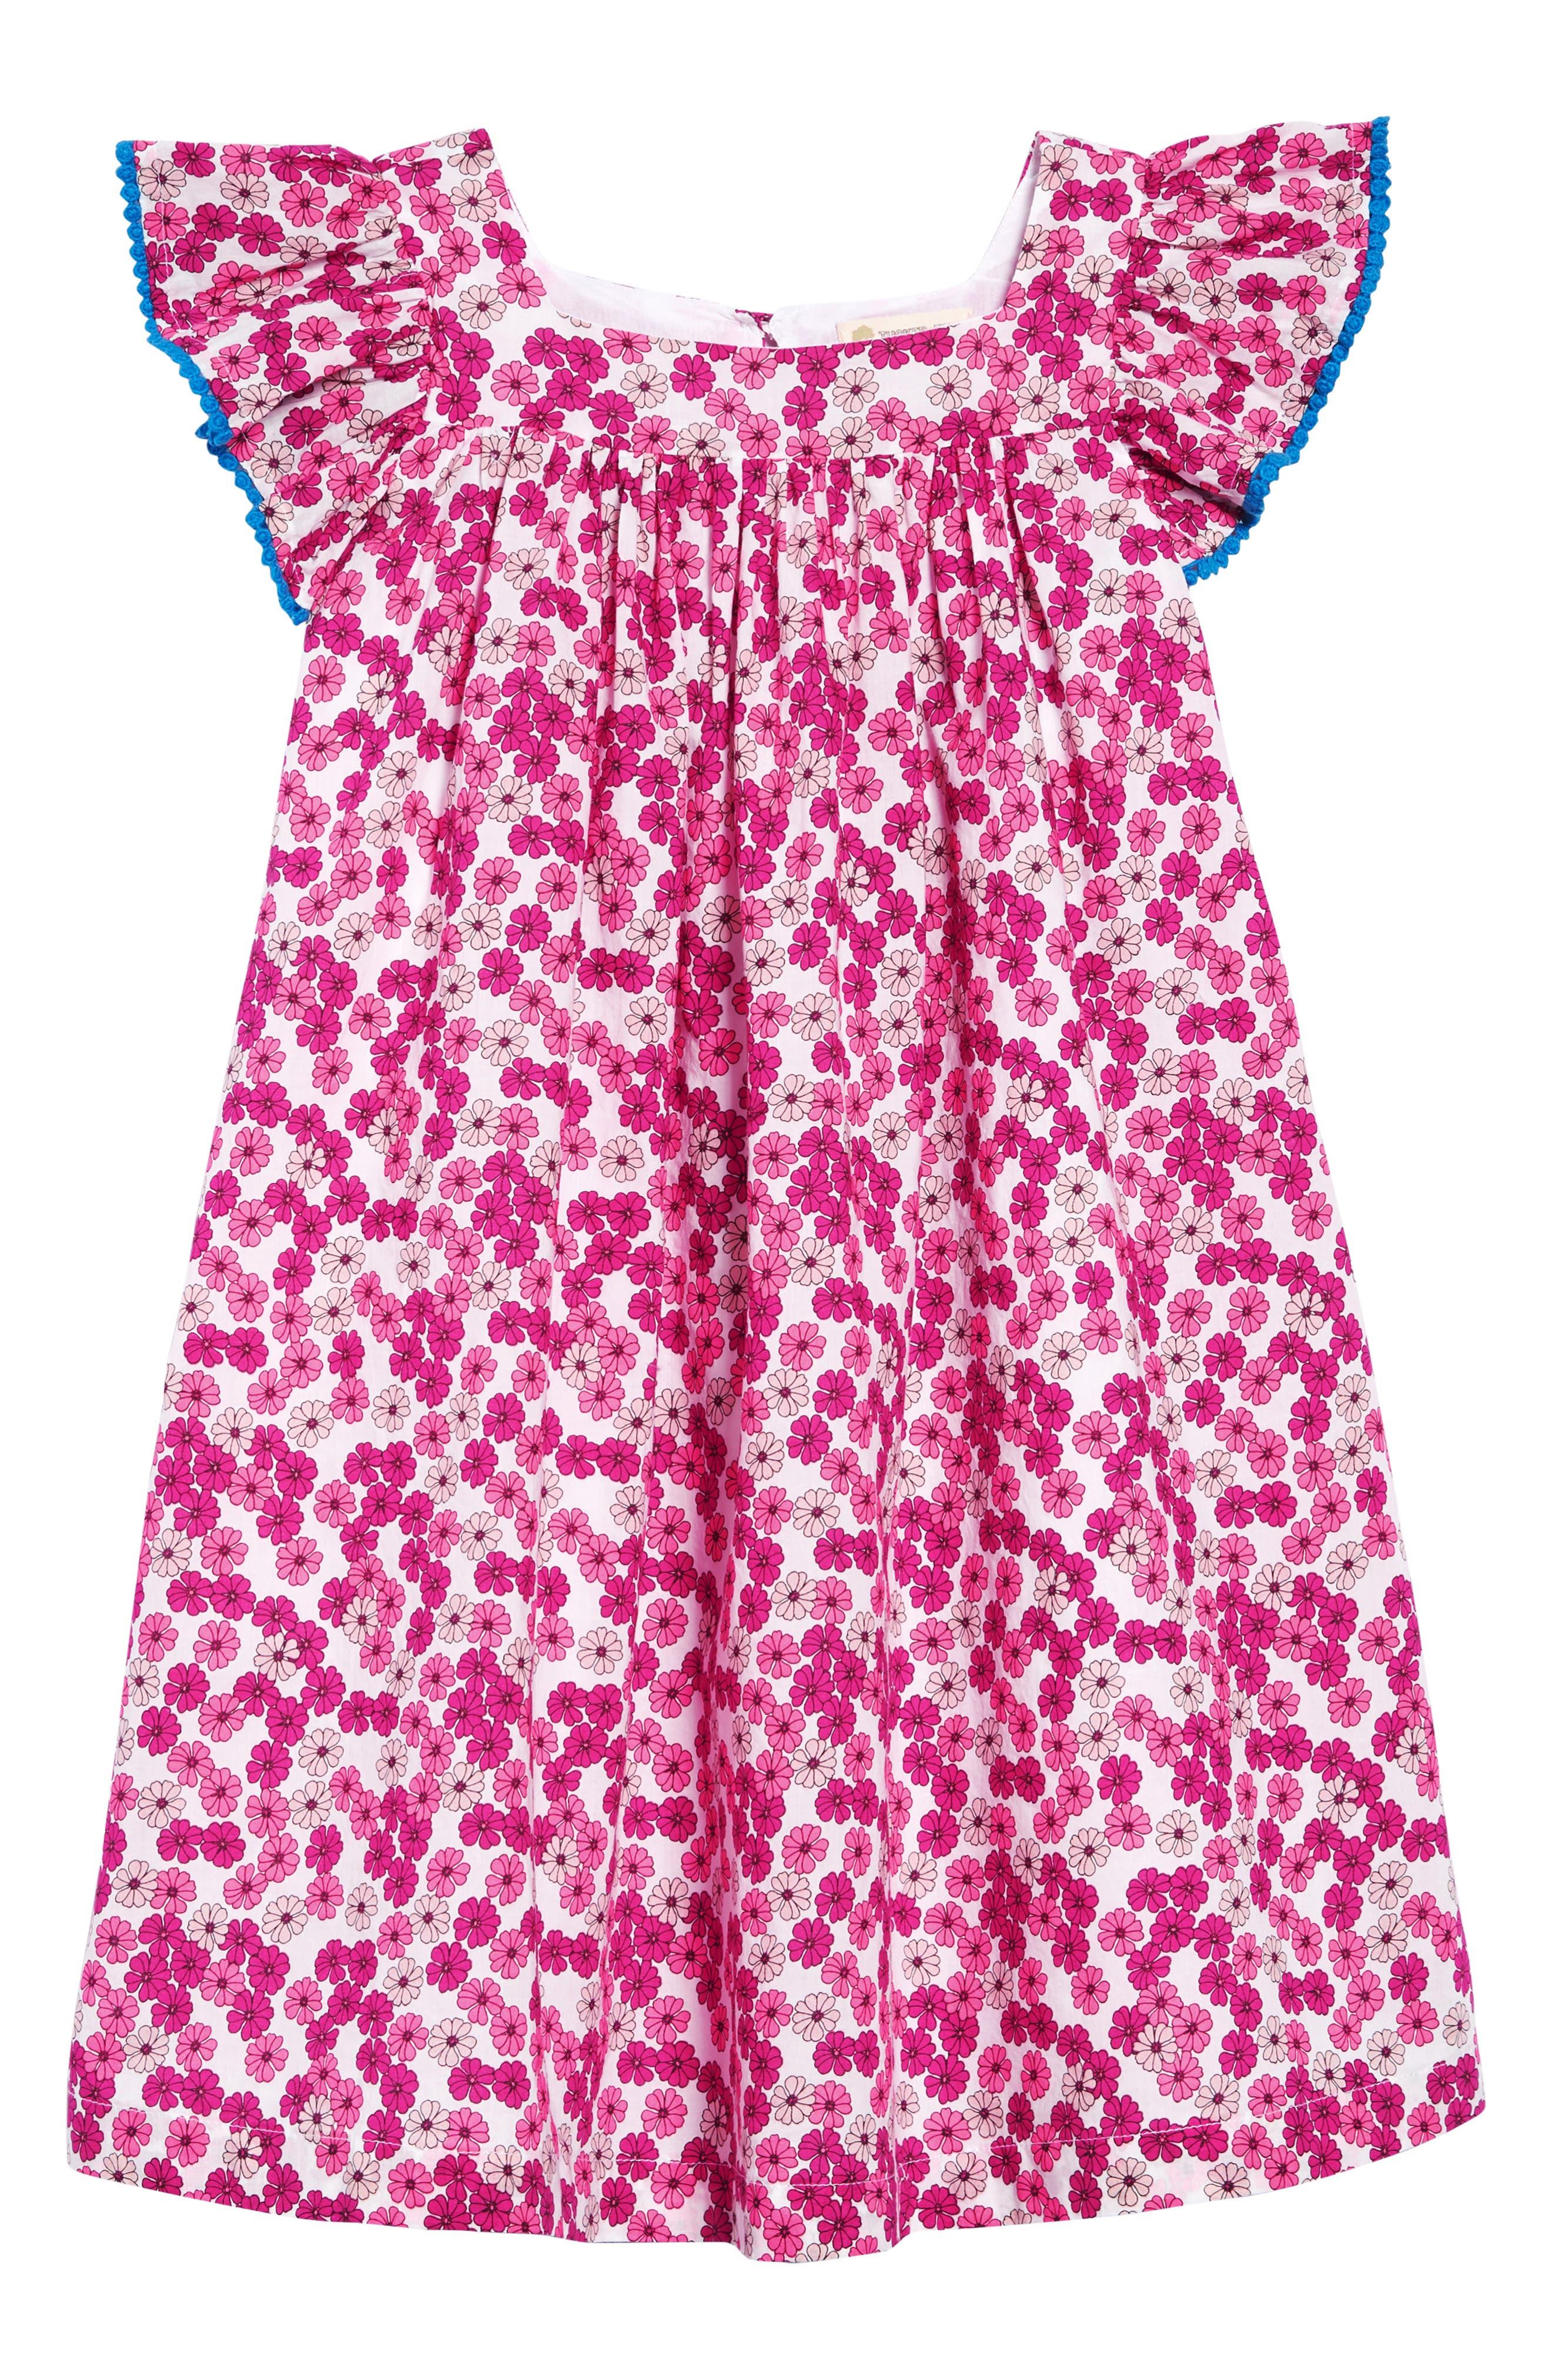 Mother & Kids Girls' Clothing Helpful 2018 Unicorn Toddler Kids Girls Summer Sundress Pink Party Dress Clothes headband Tri Cute Summer Outfits